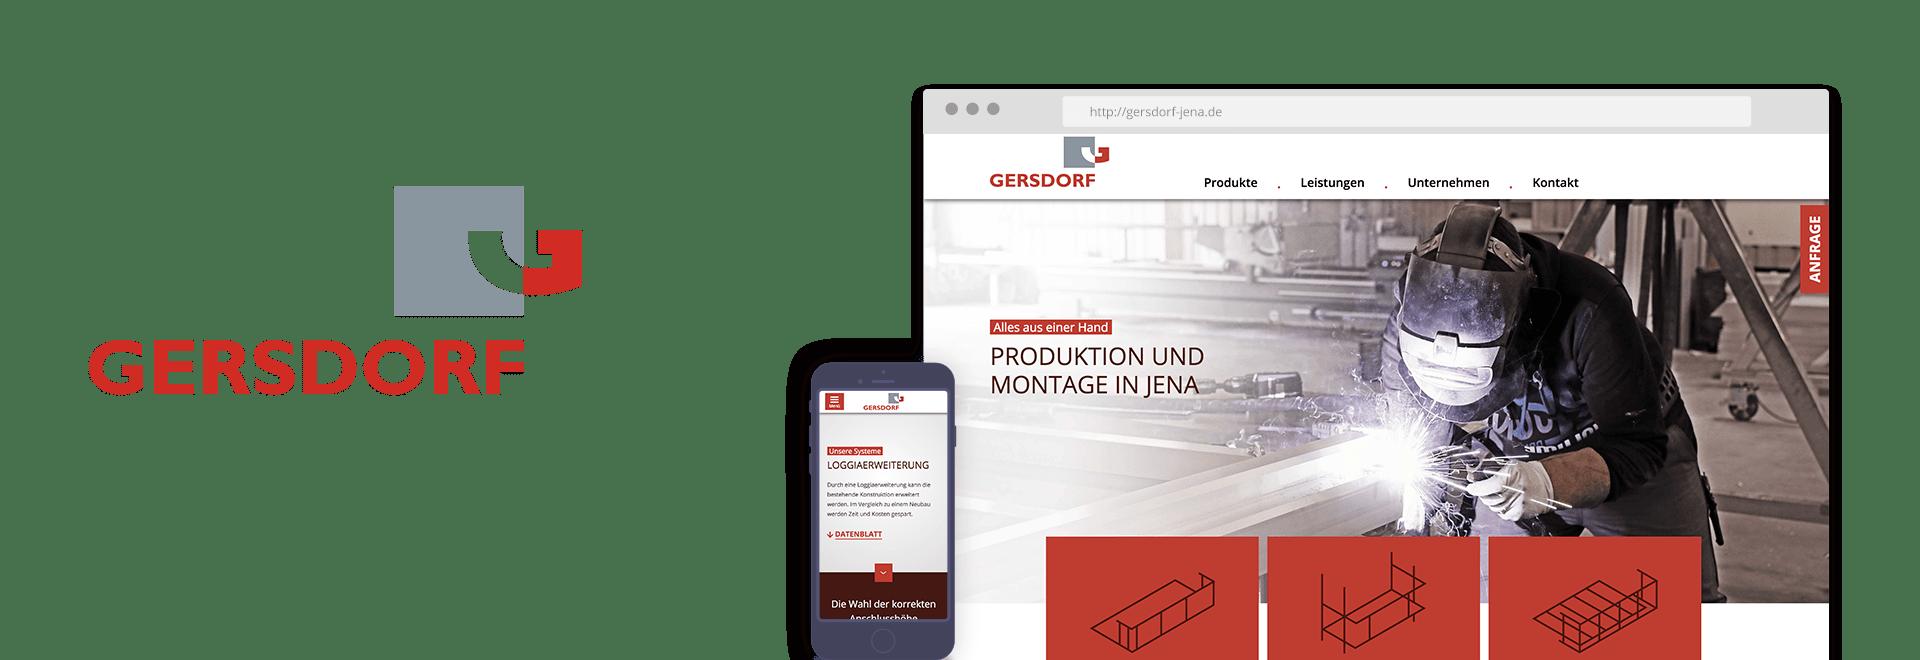 Gersdorf Balkonsystem GmbH